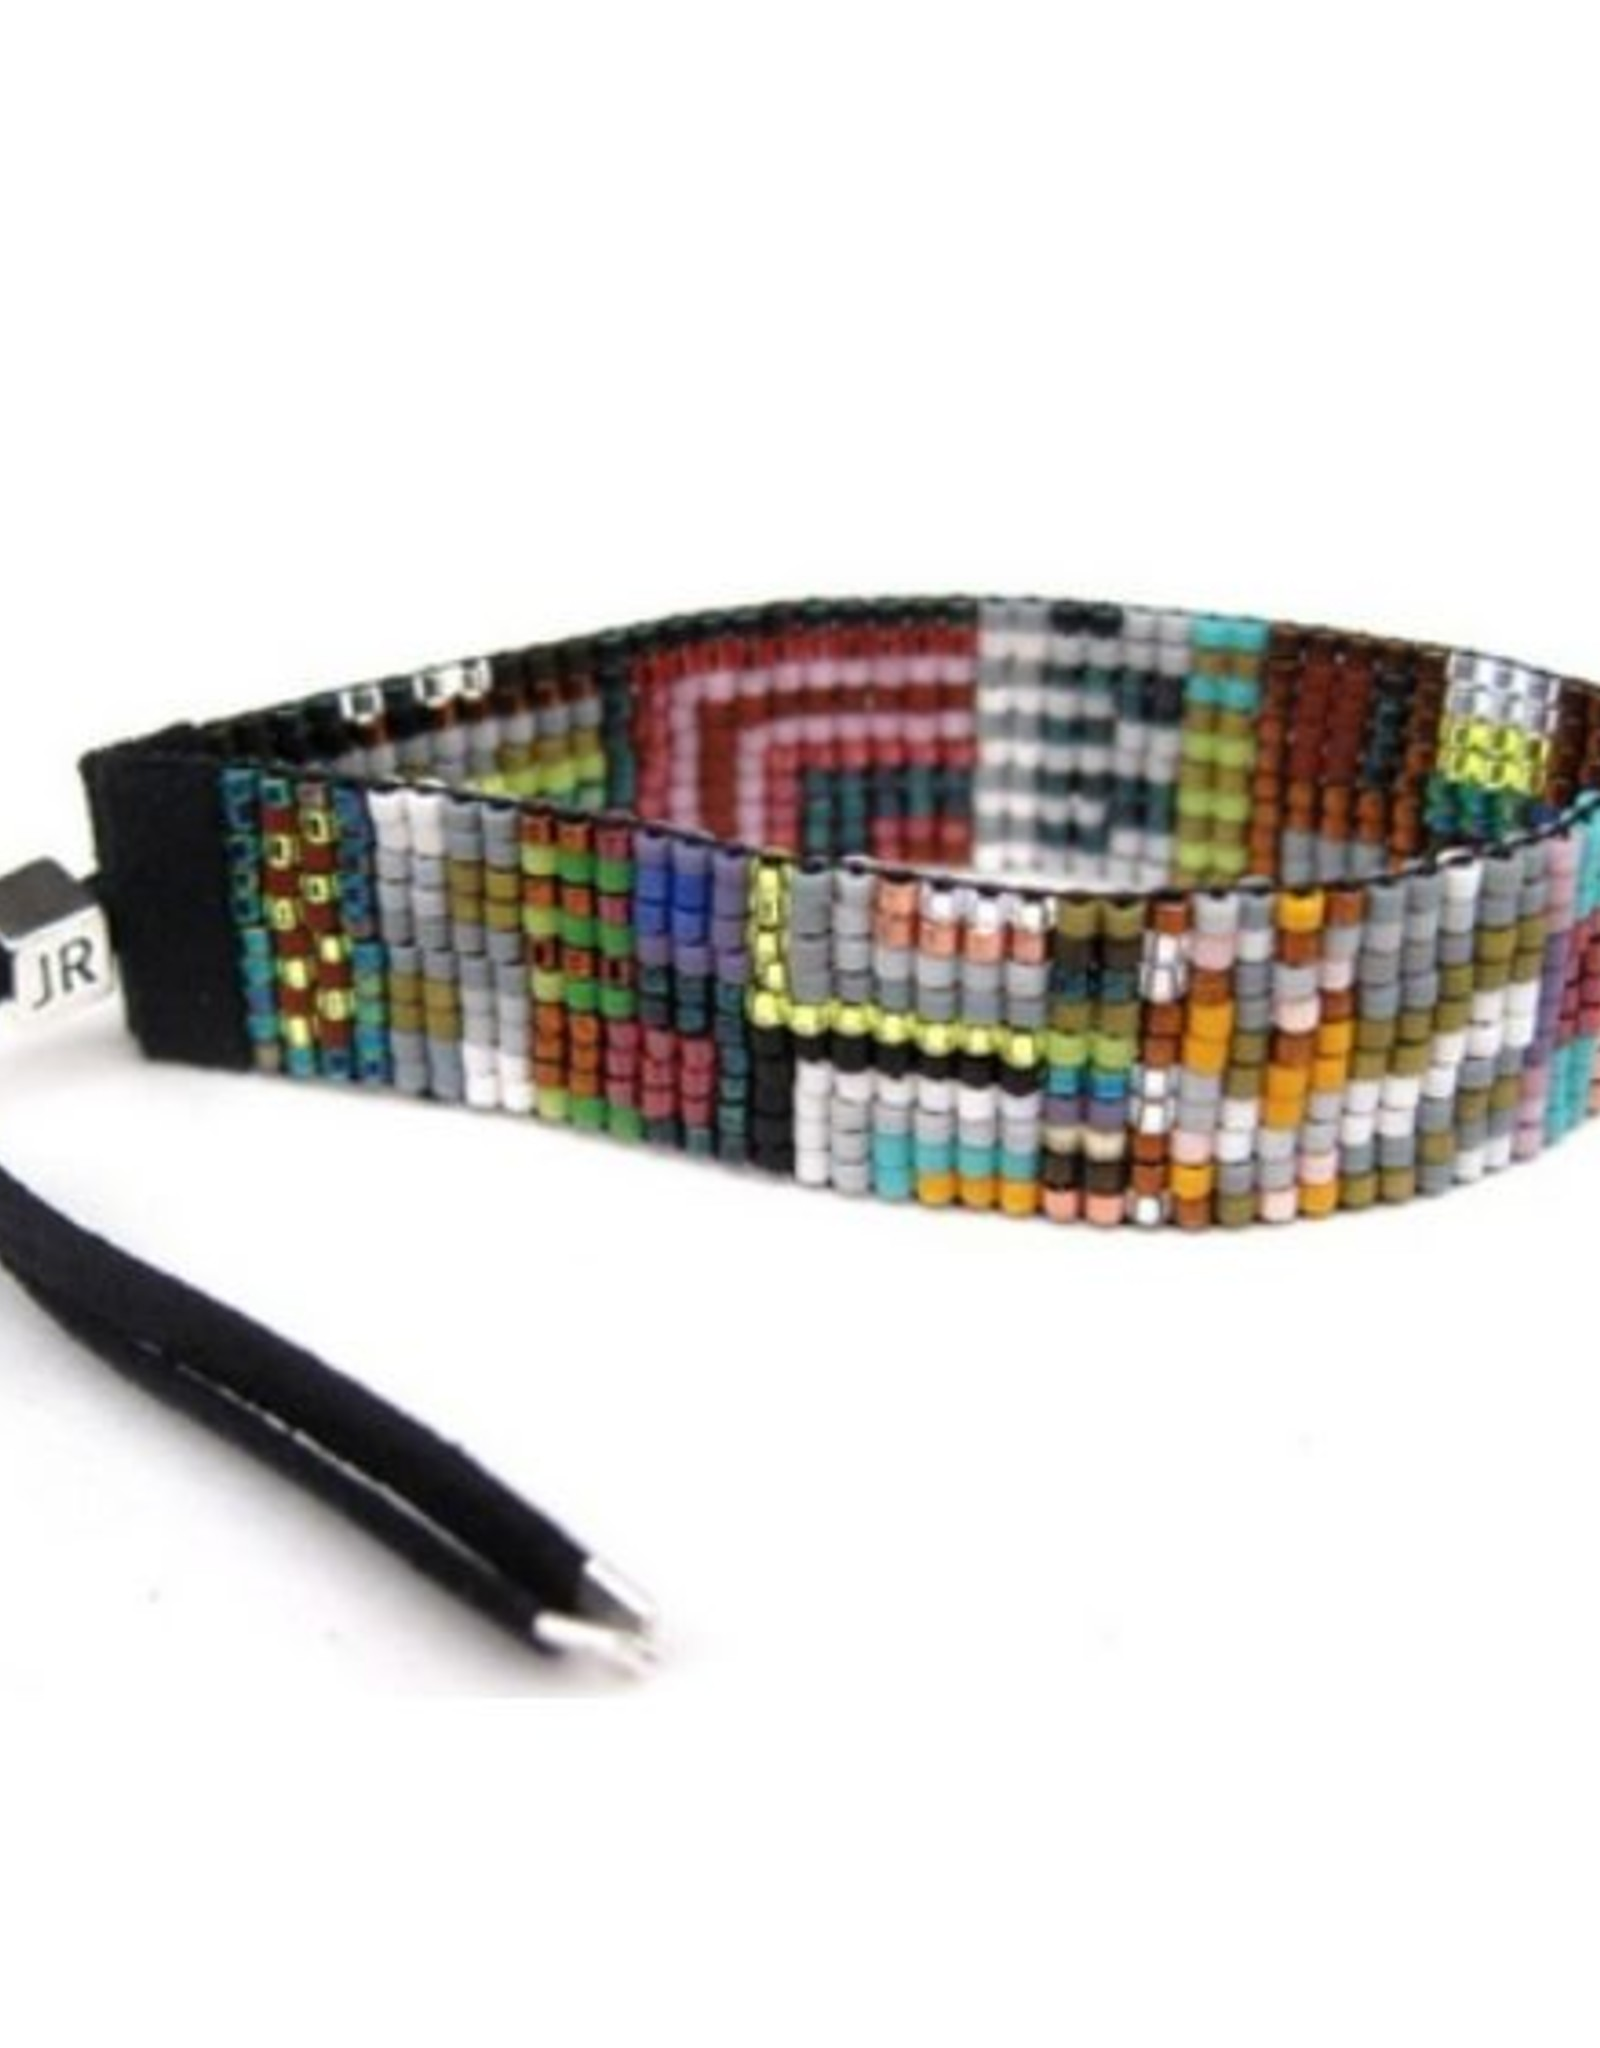 Julie Rofman Jewelry Morocco Beaded Bracelet